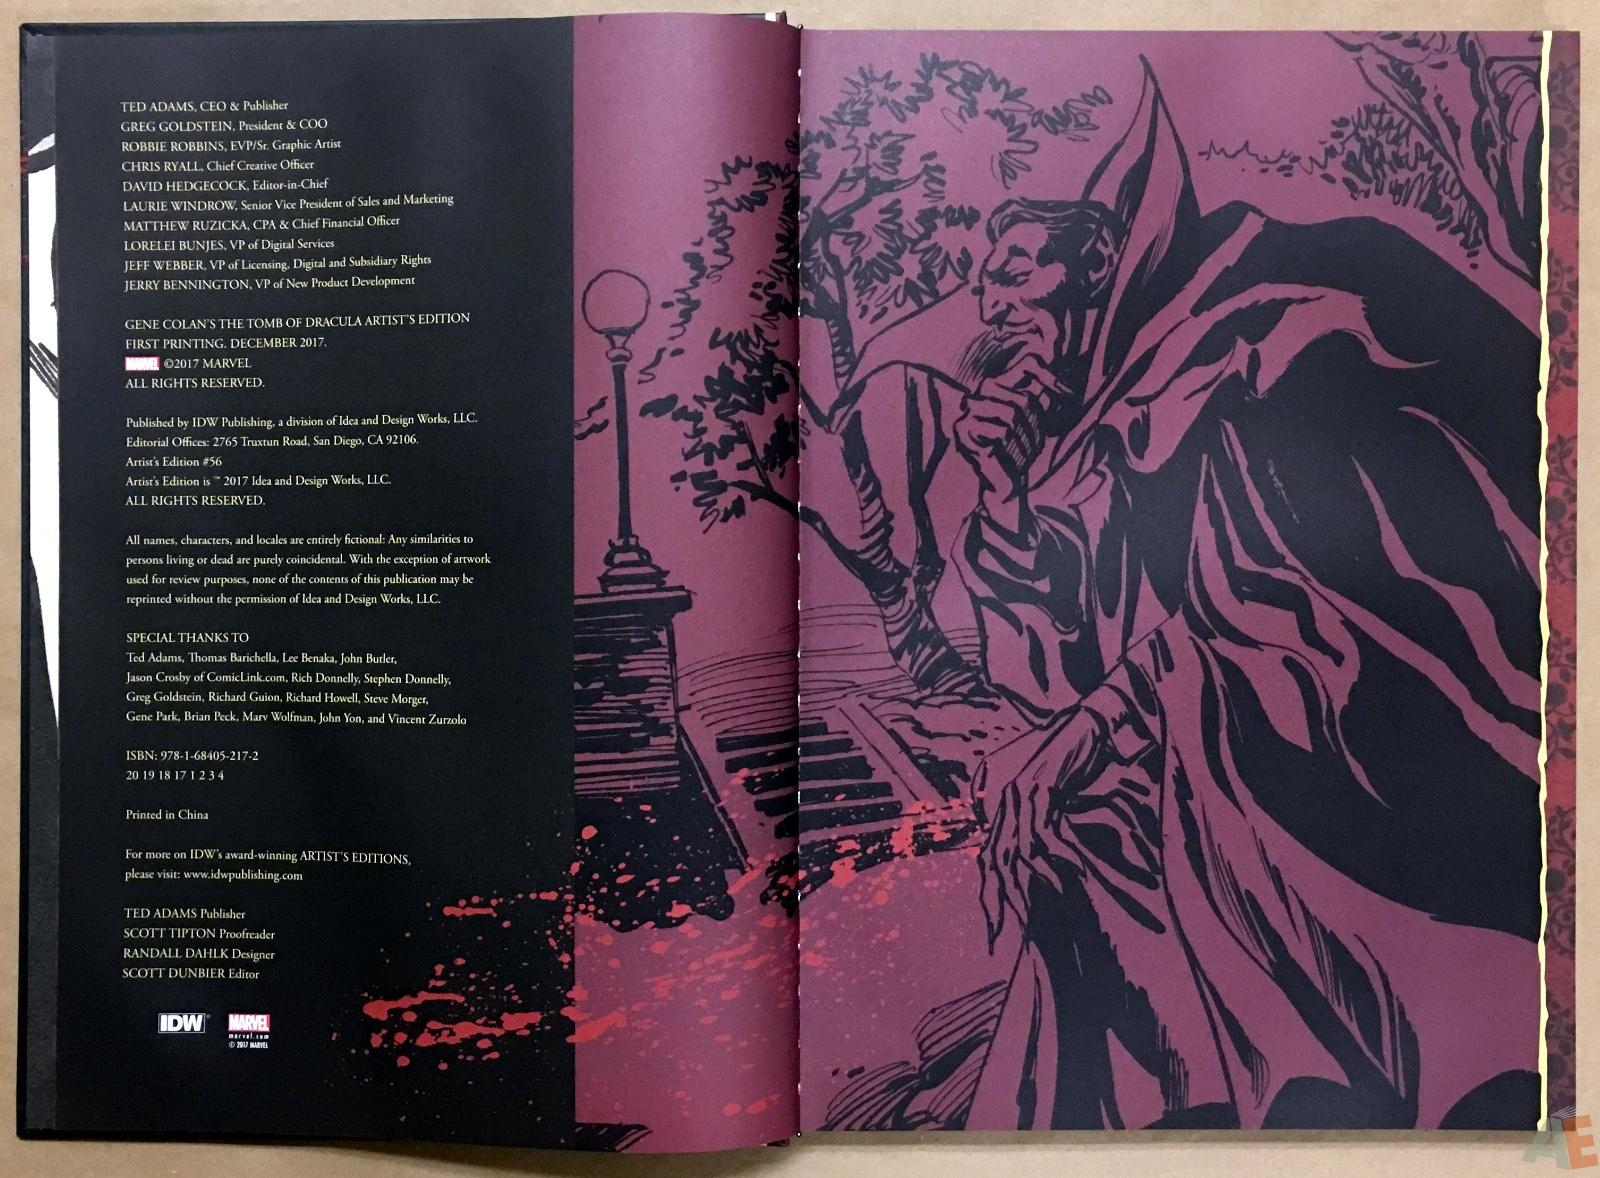 Gene Colan's Tomb Of Dracula Artist's Edition